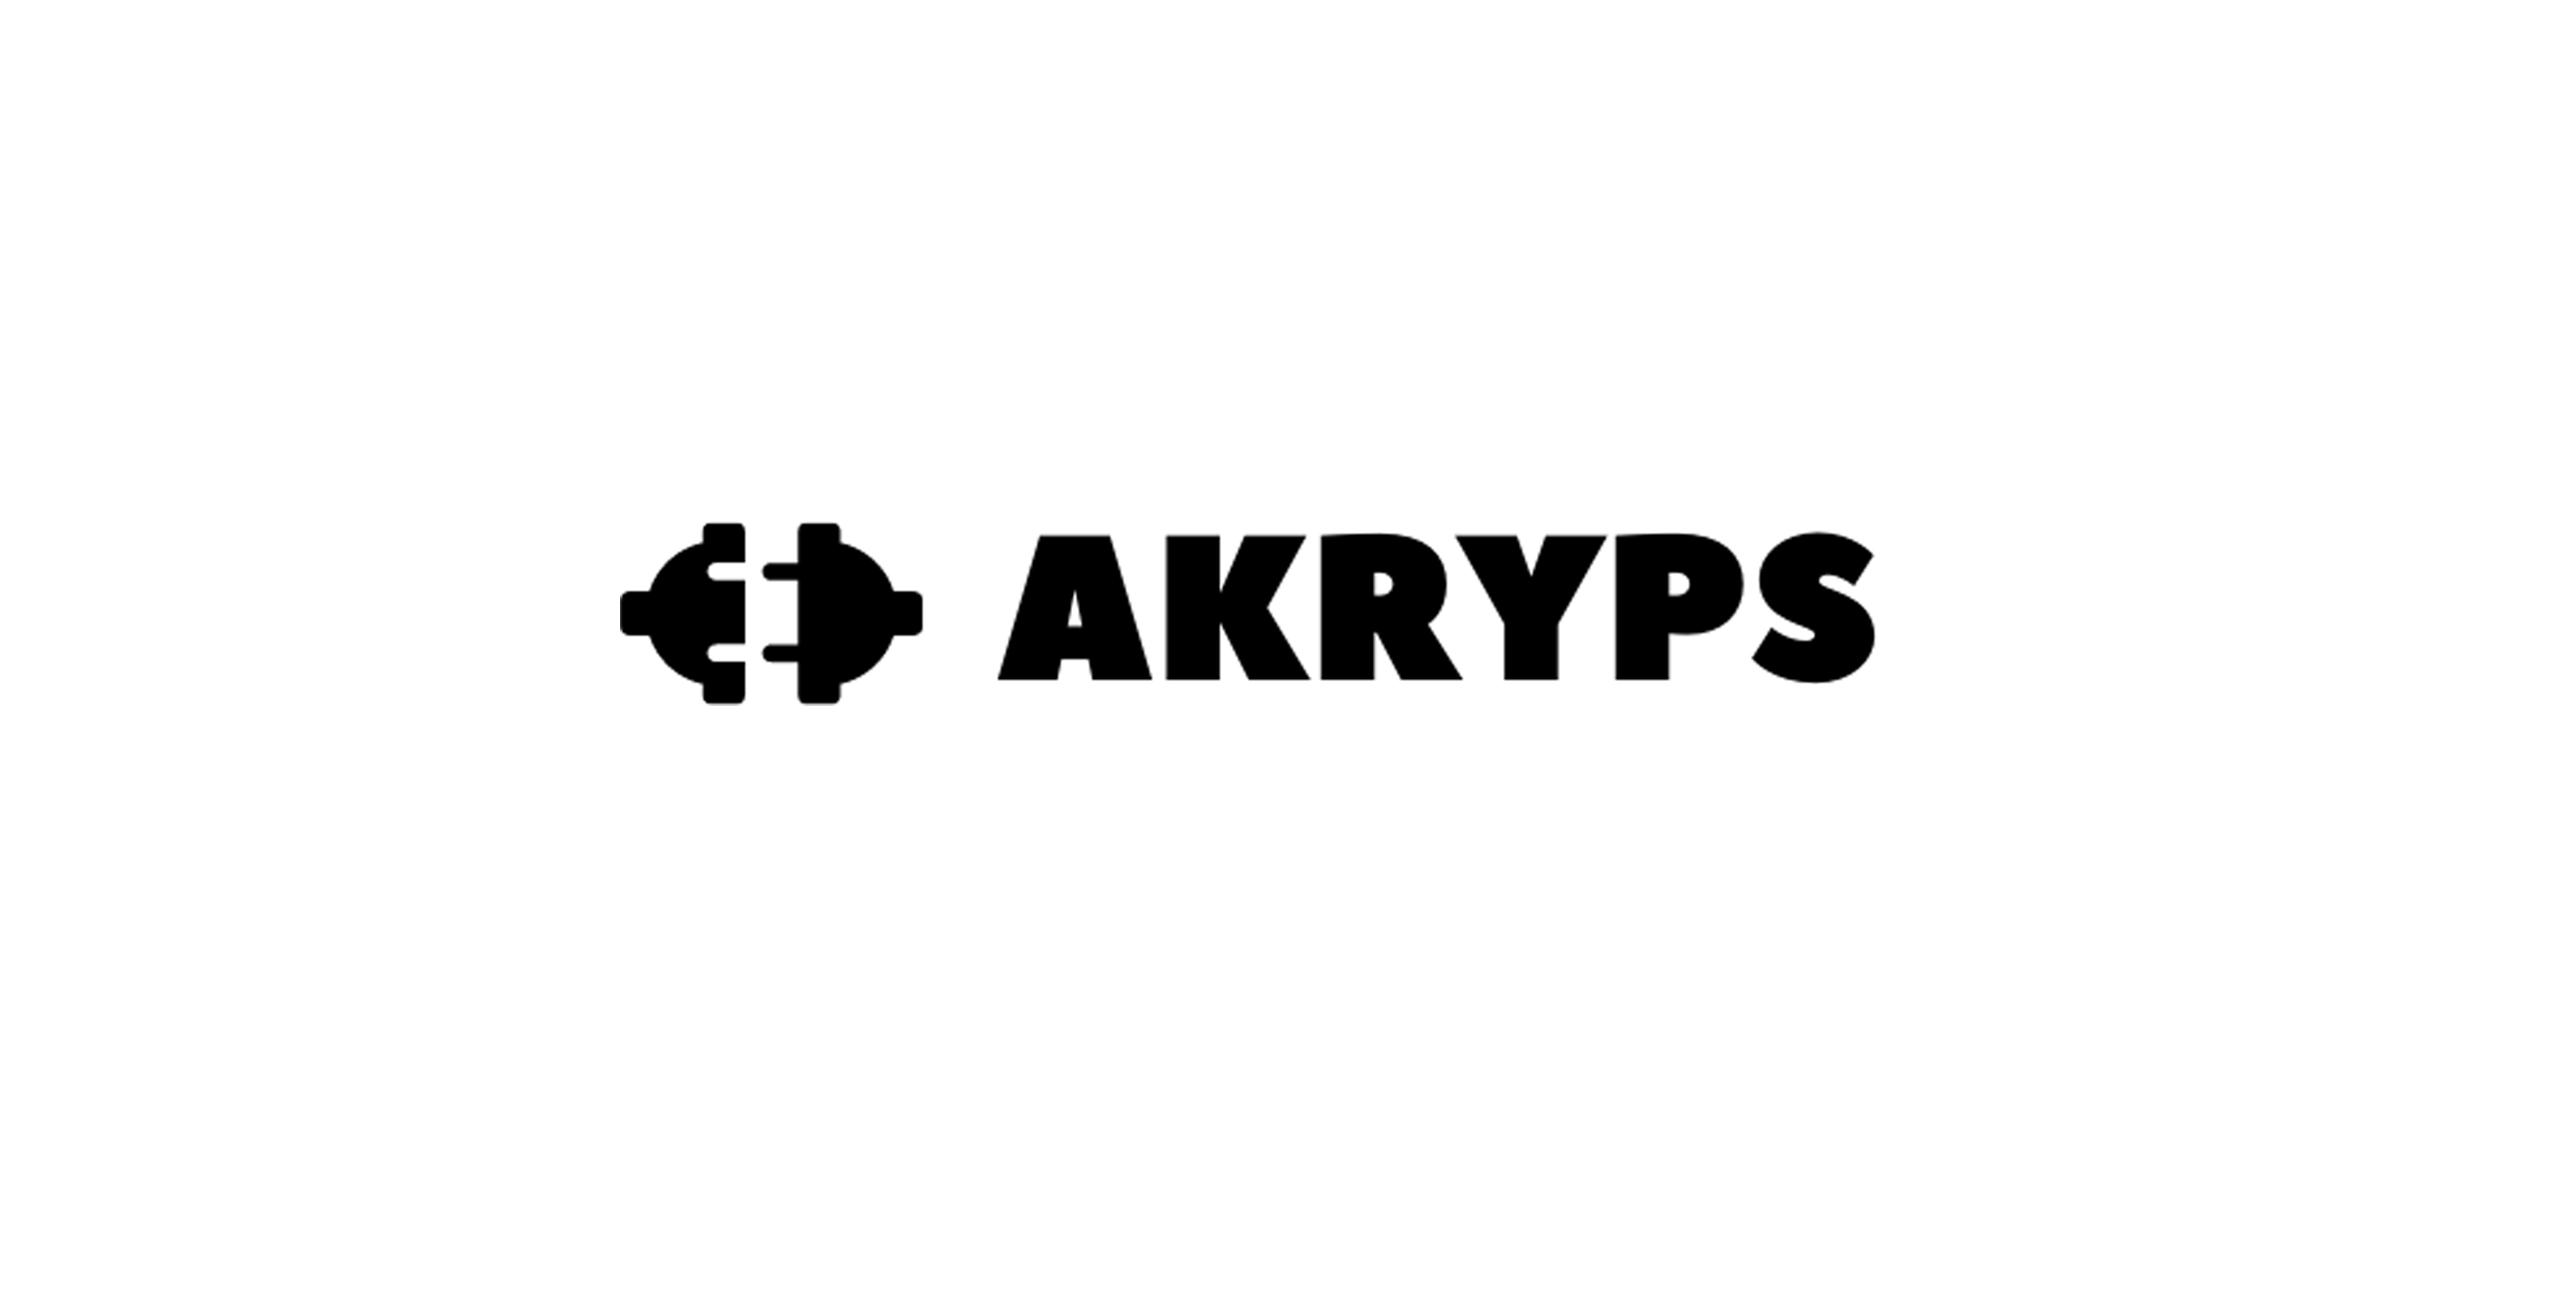 AKRYPS